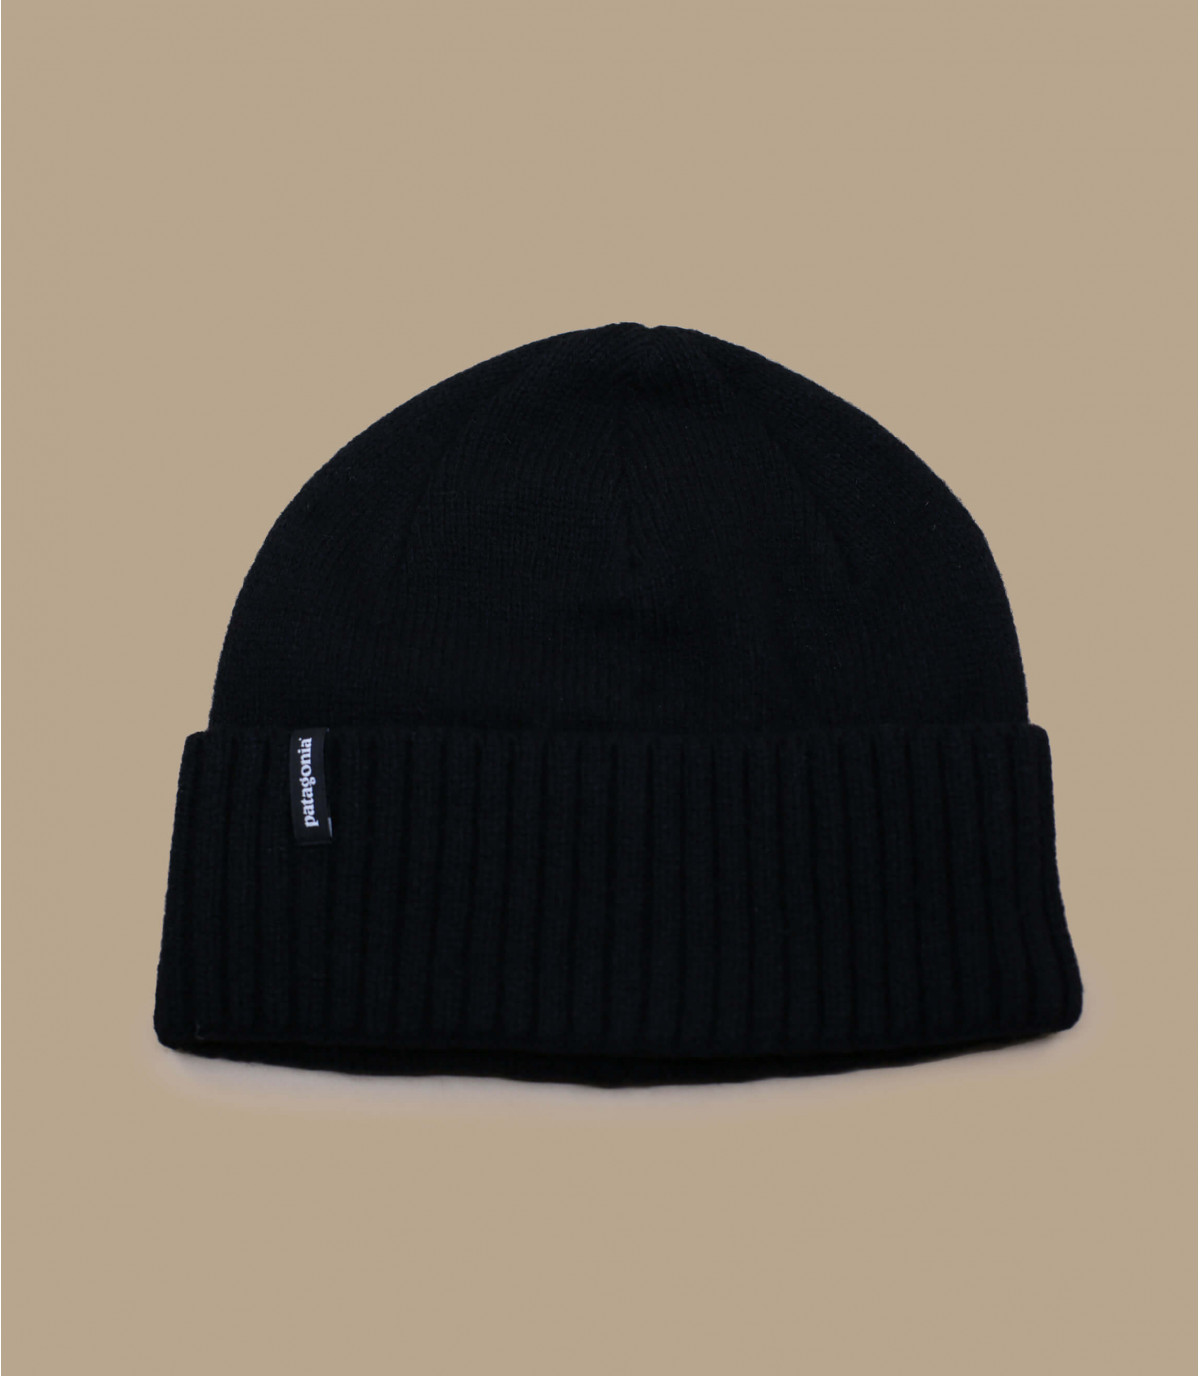 Cappello di lana nero Patagonia